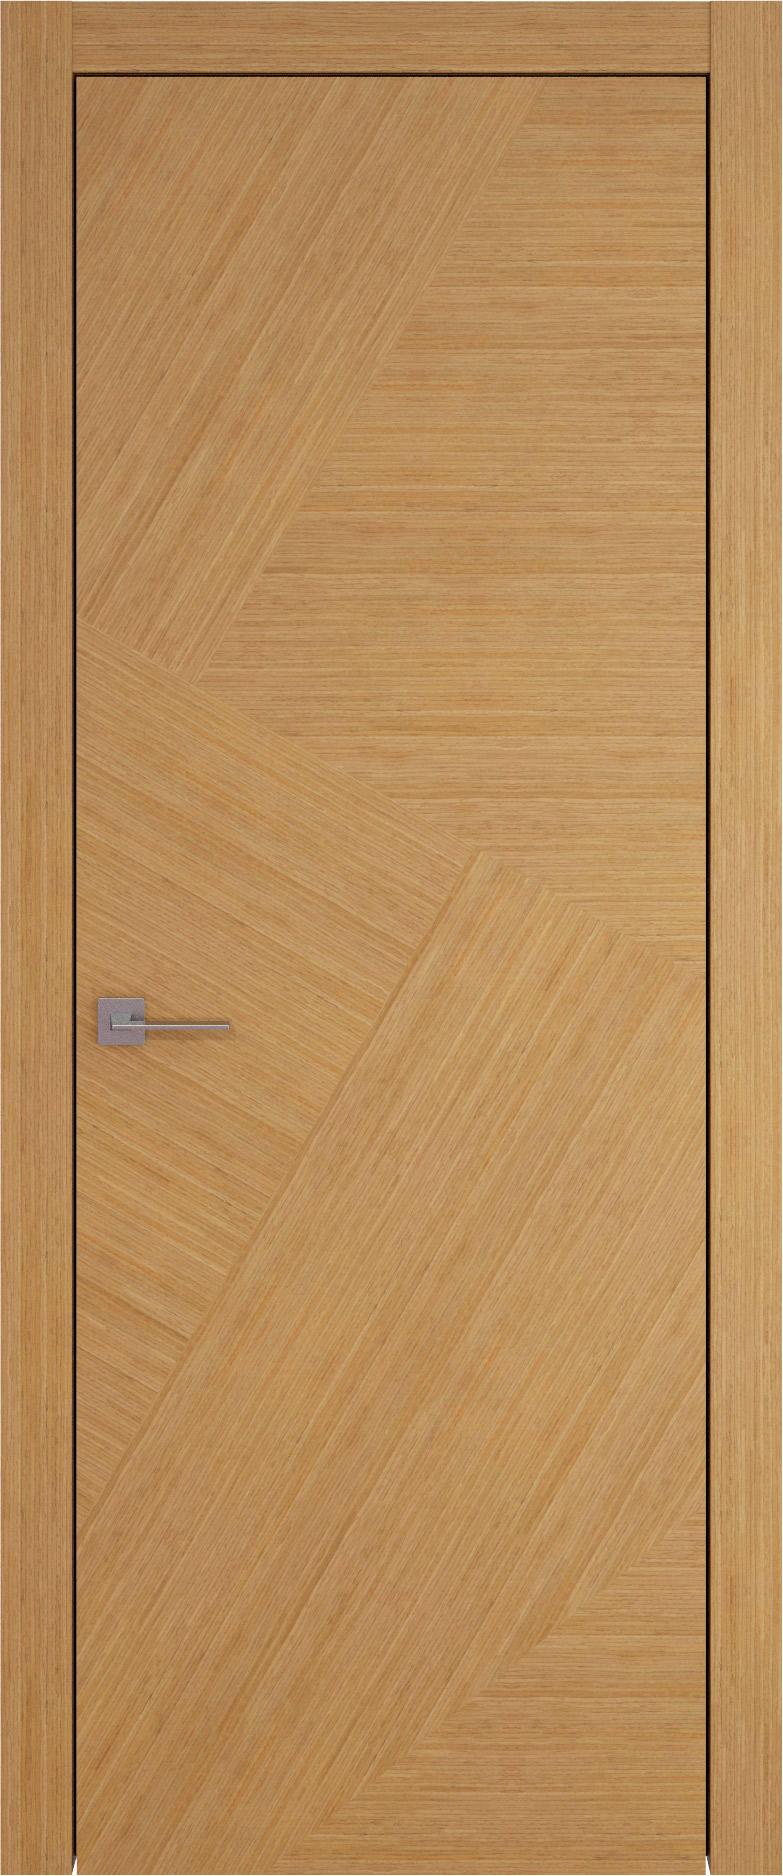 Tivoli М-1 цвет - Миланский орех Без стекла (ДГ)